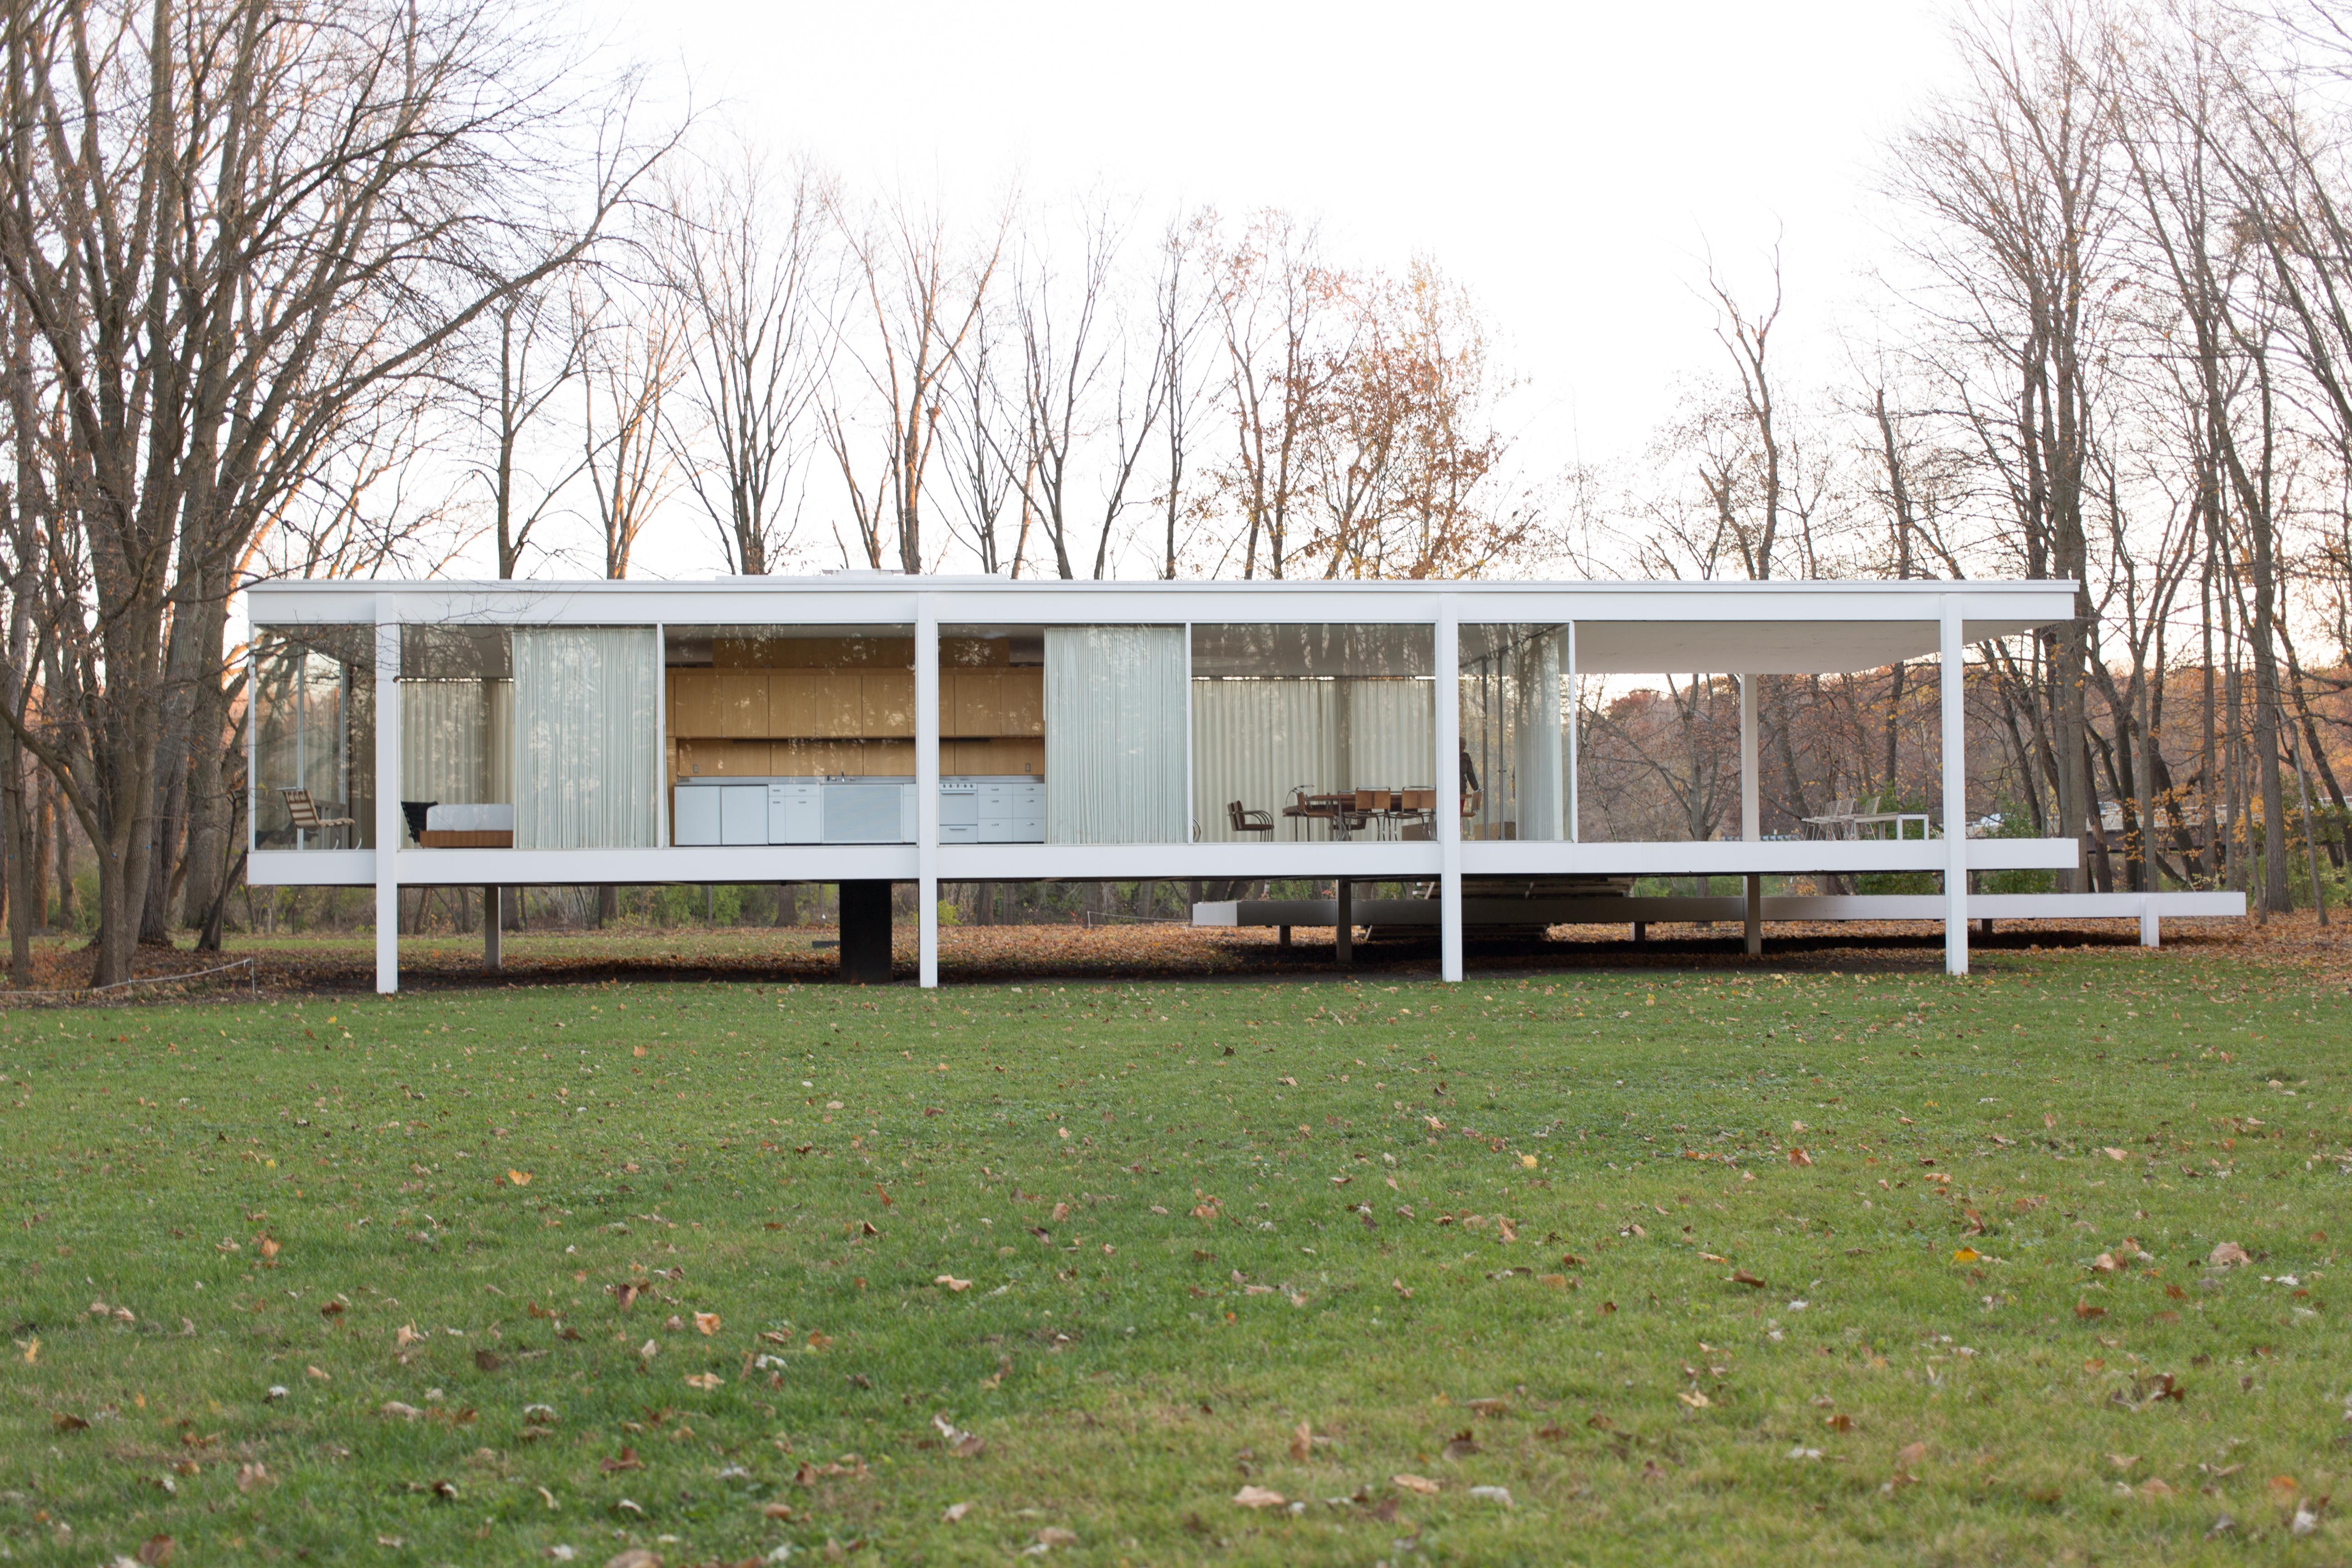 Farnsworth house by mies van der rohe exterior 8 jpg - Farnsworth House By Mies Van Der Rohe Exterior 8 Jpg 1